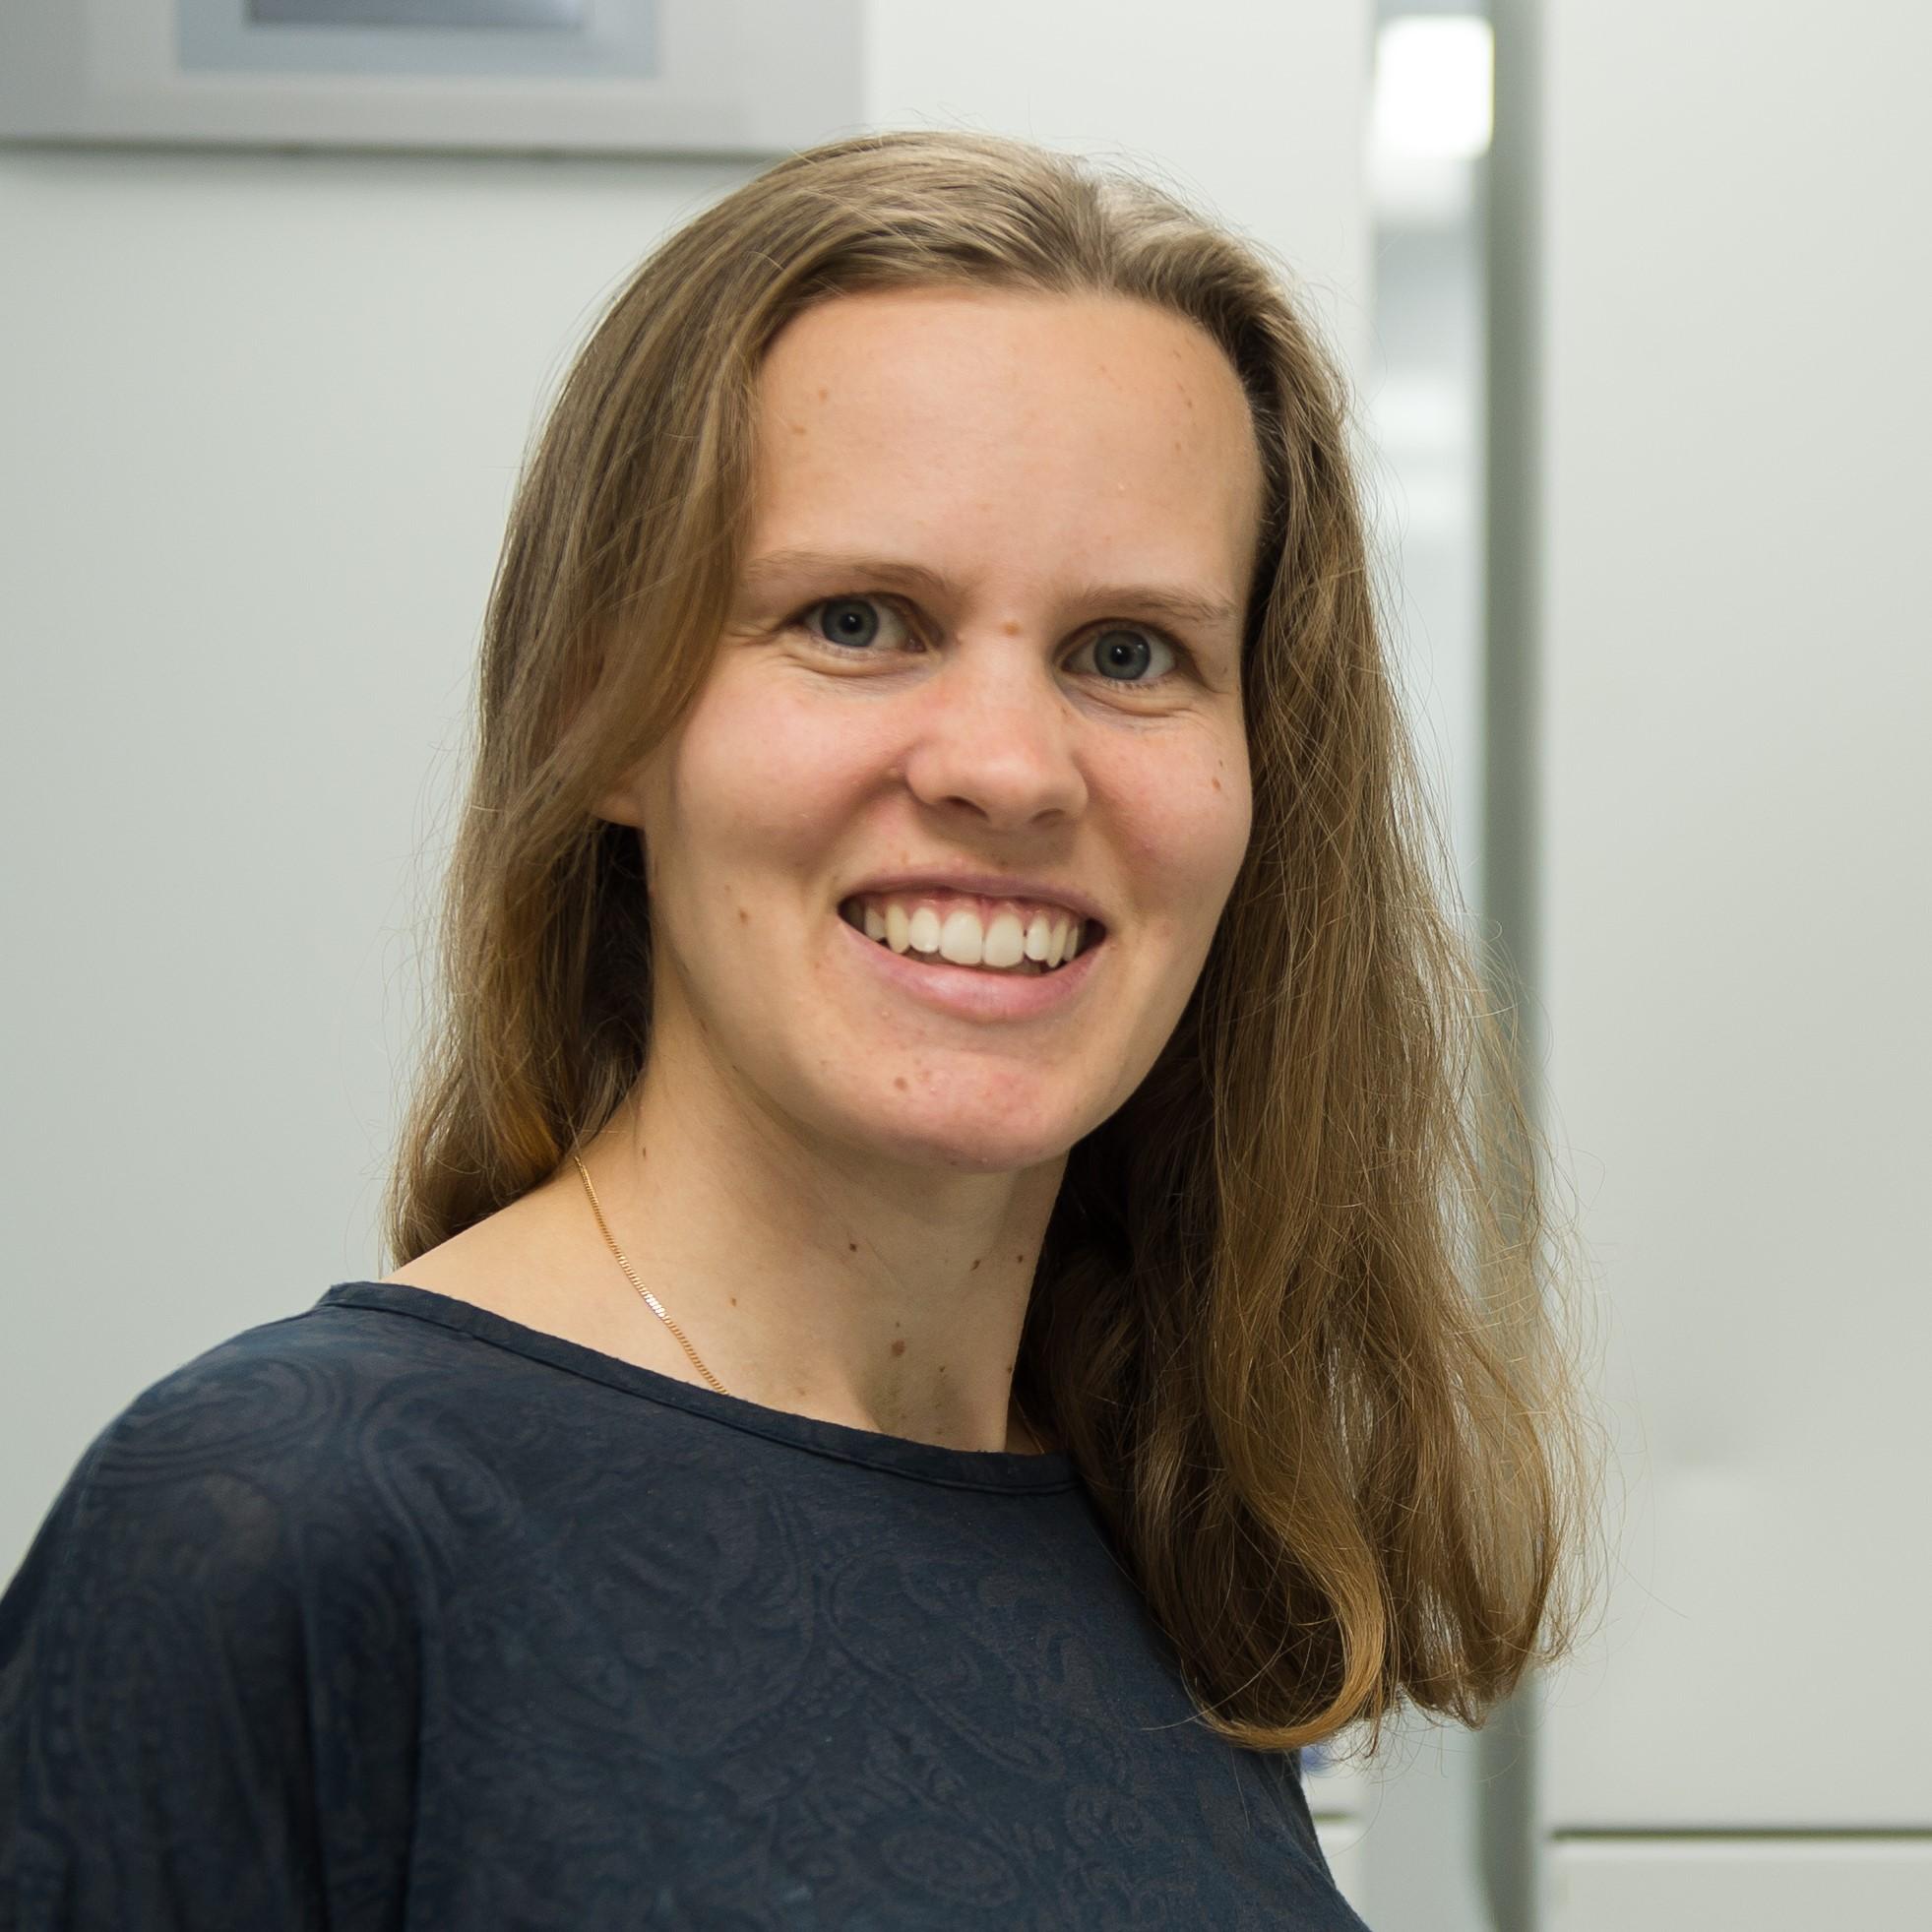 Sofia Lindegård, MSc